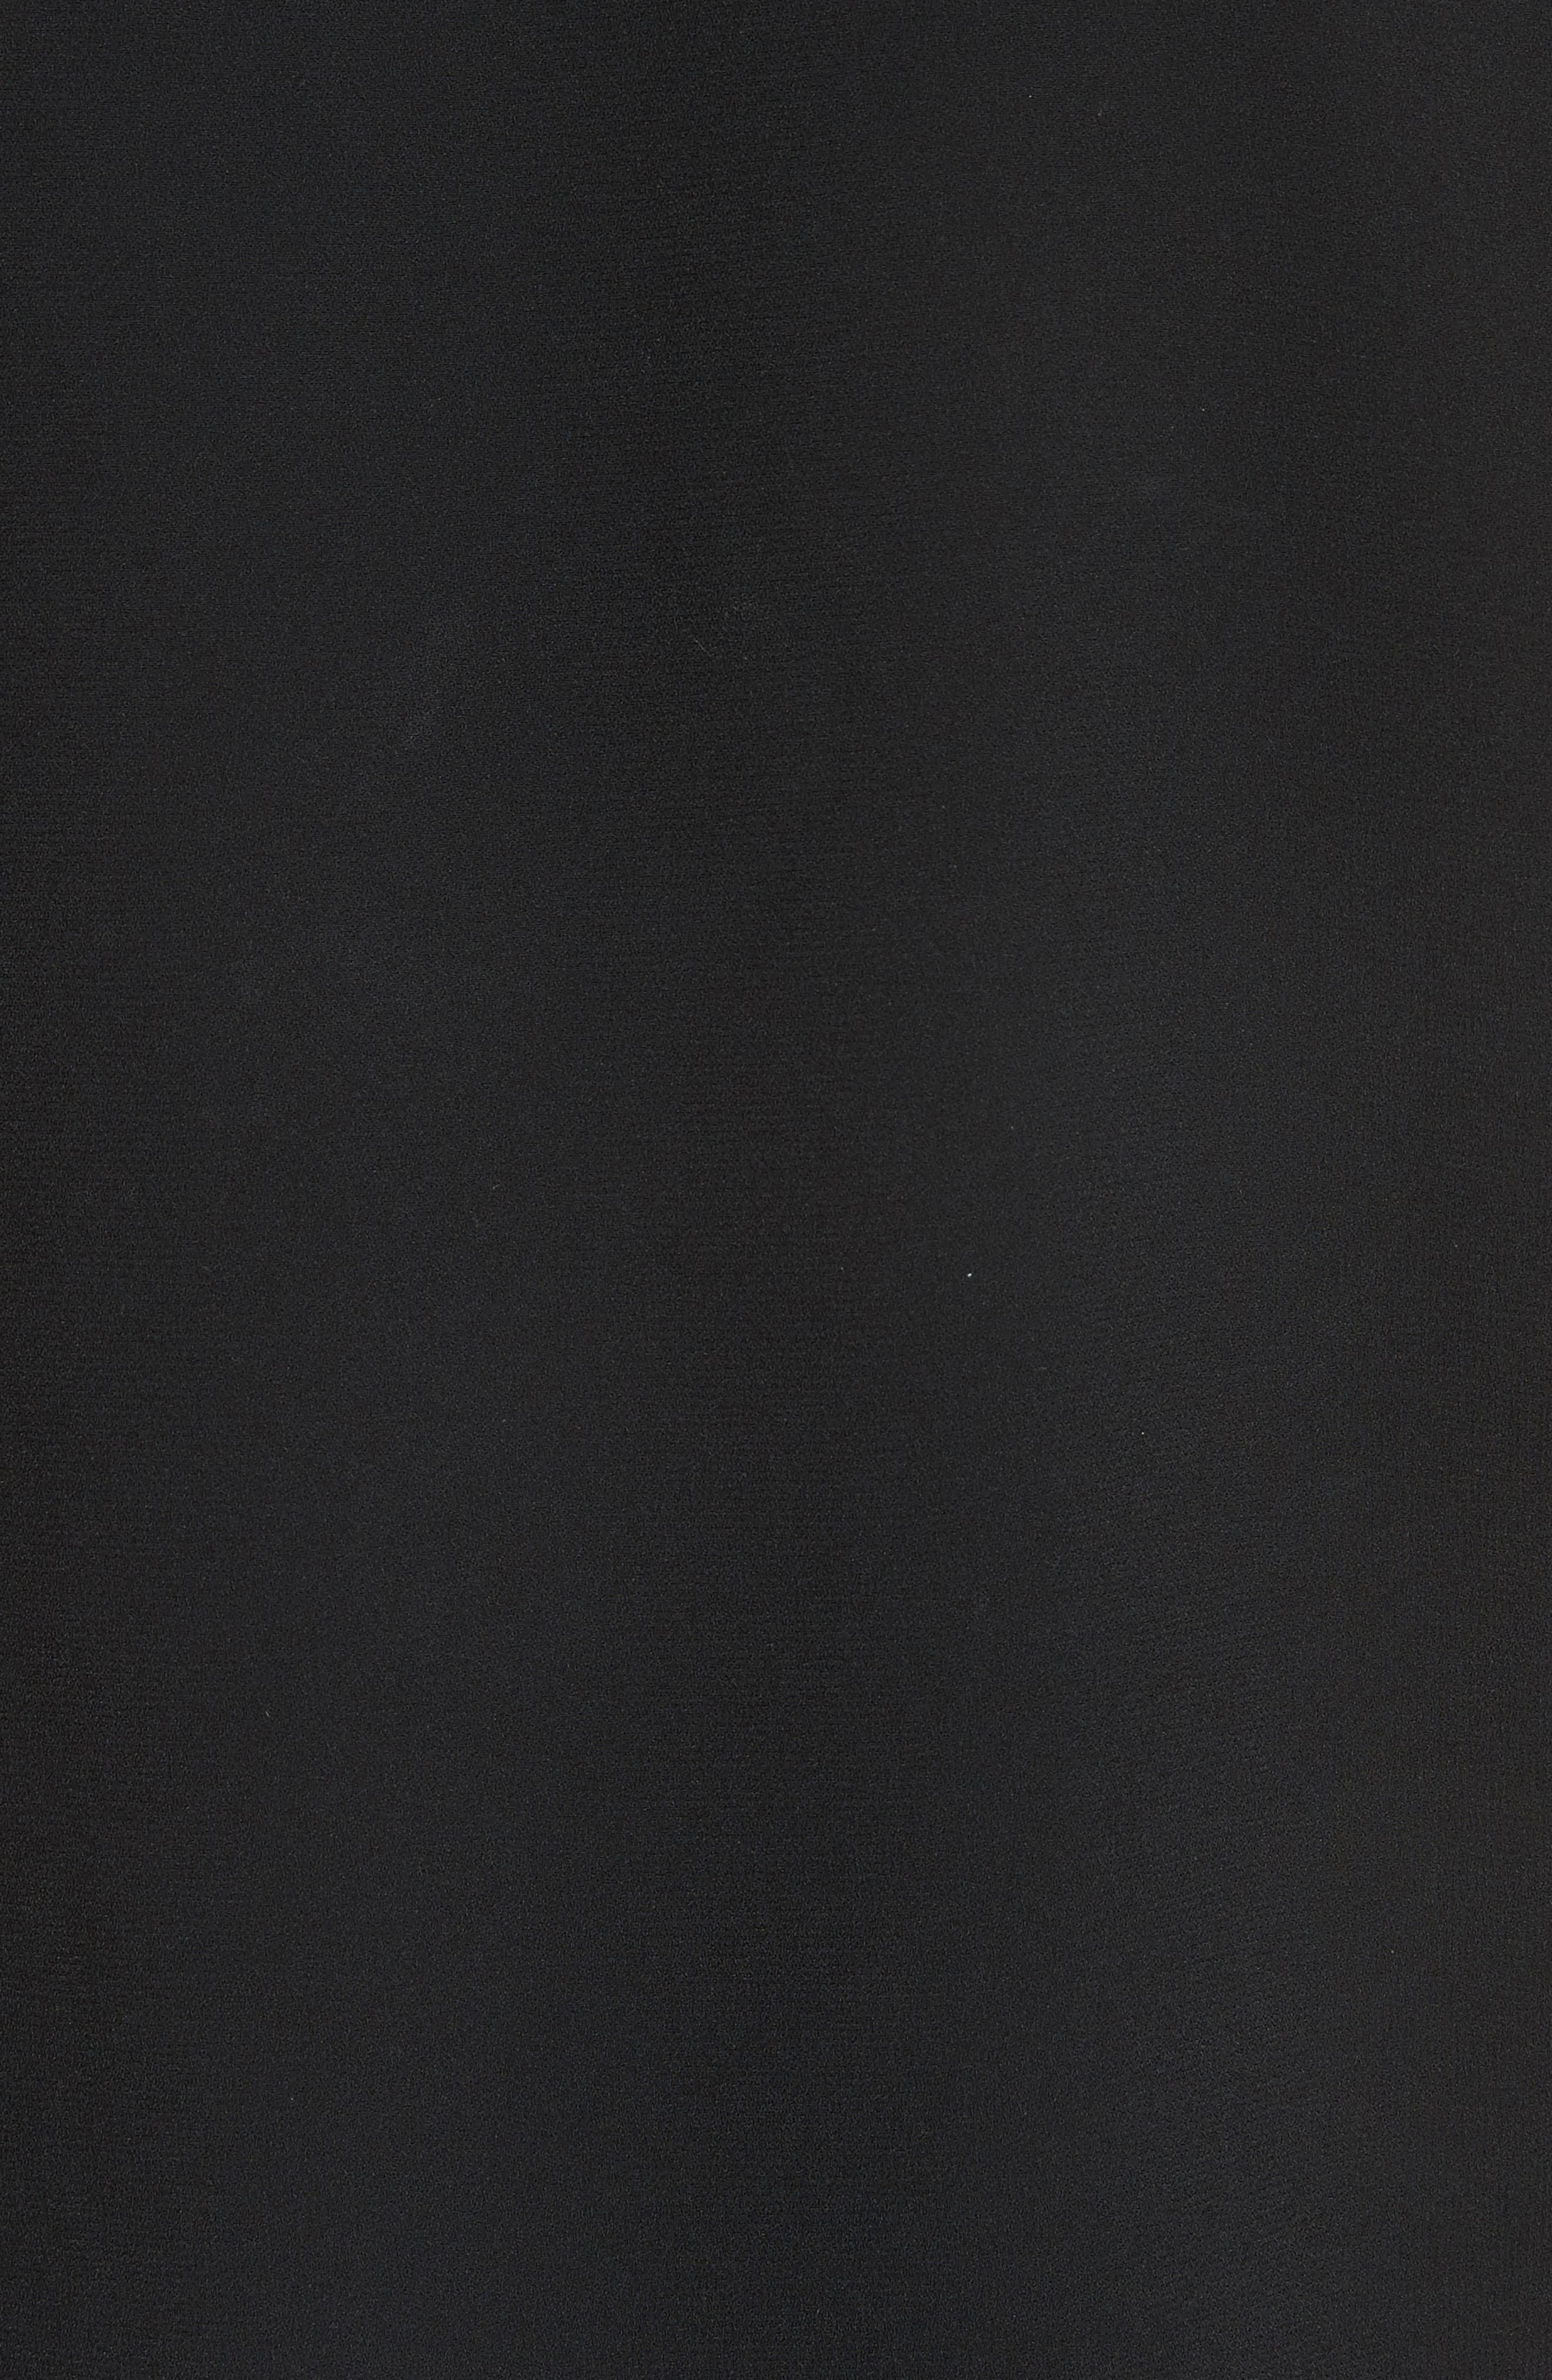 Mica Contrast Trim Crop Top,                             Alternate thumbnail 6, color,                             Black